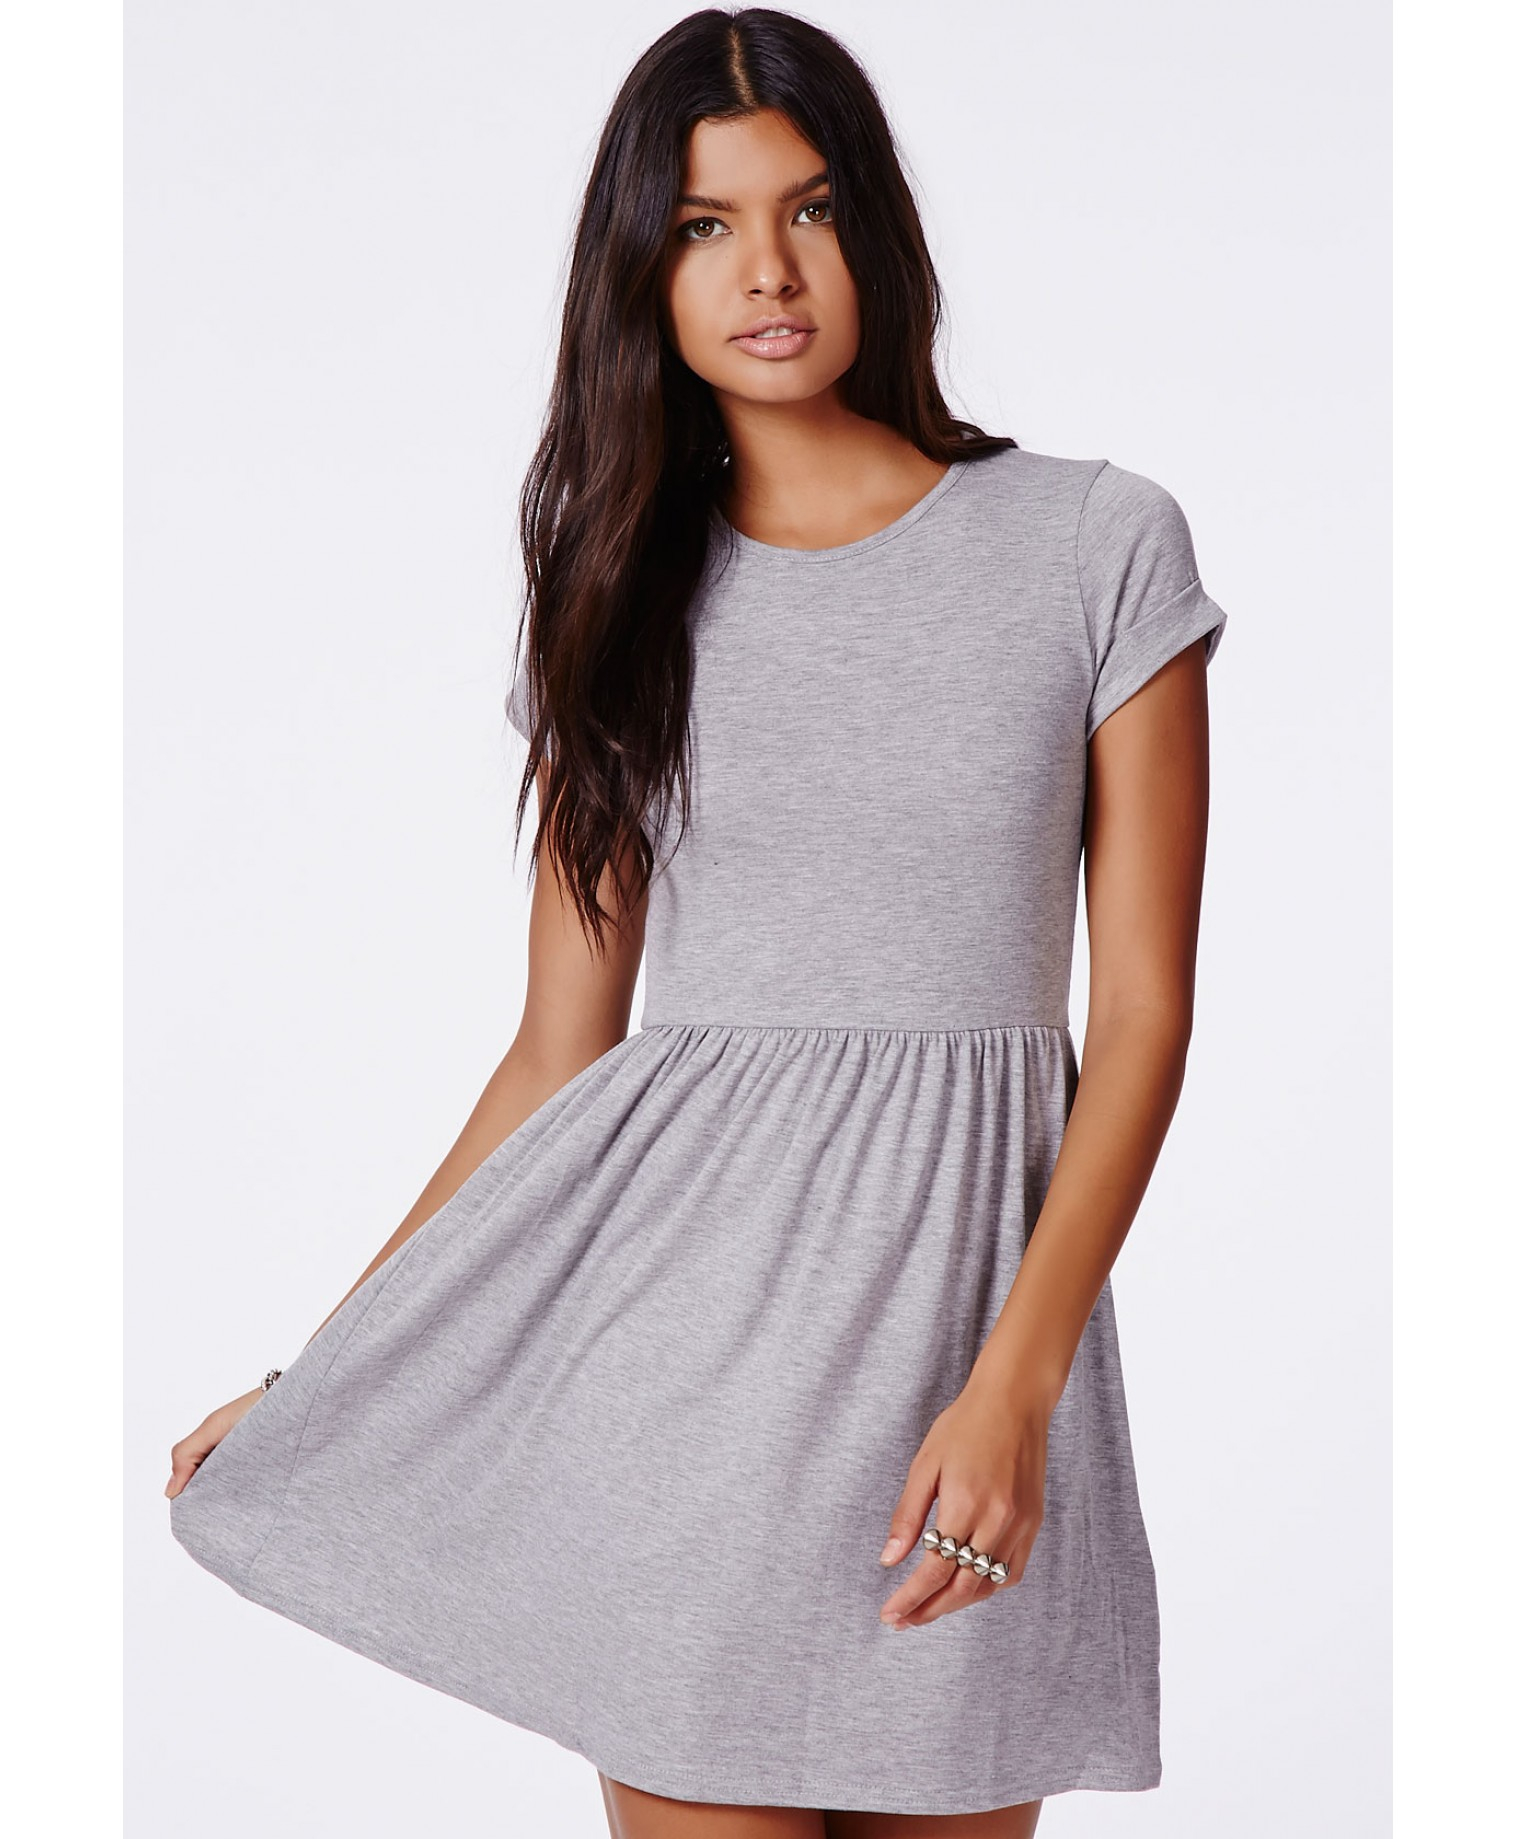 Missguided Aliveta T-Shirt Skater Dress in Gray - Lyst d3e75d6a7b2b